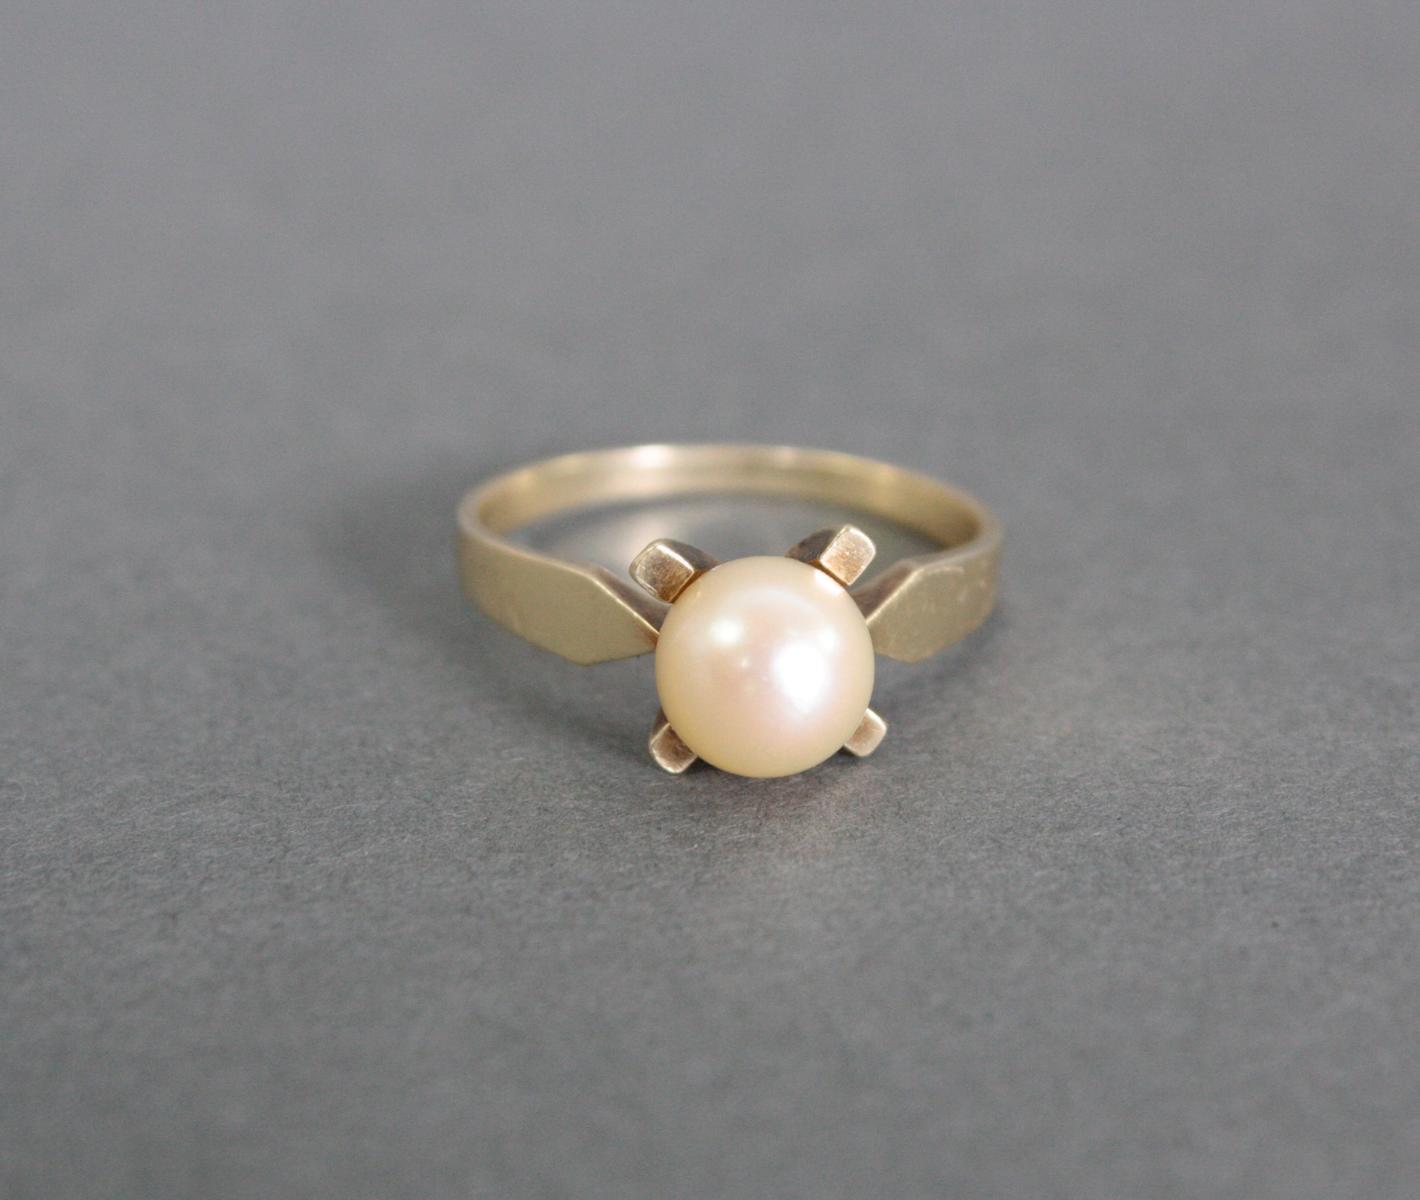 Damenring mit Perle, 14 Karat Gelbgold